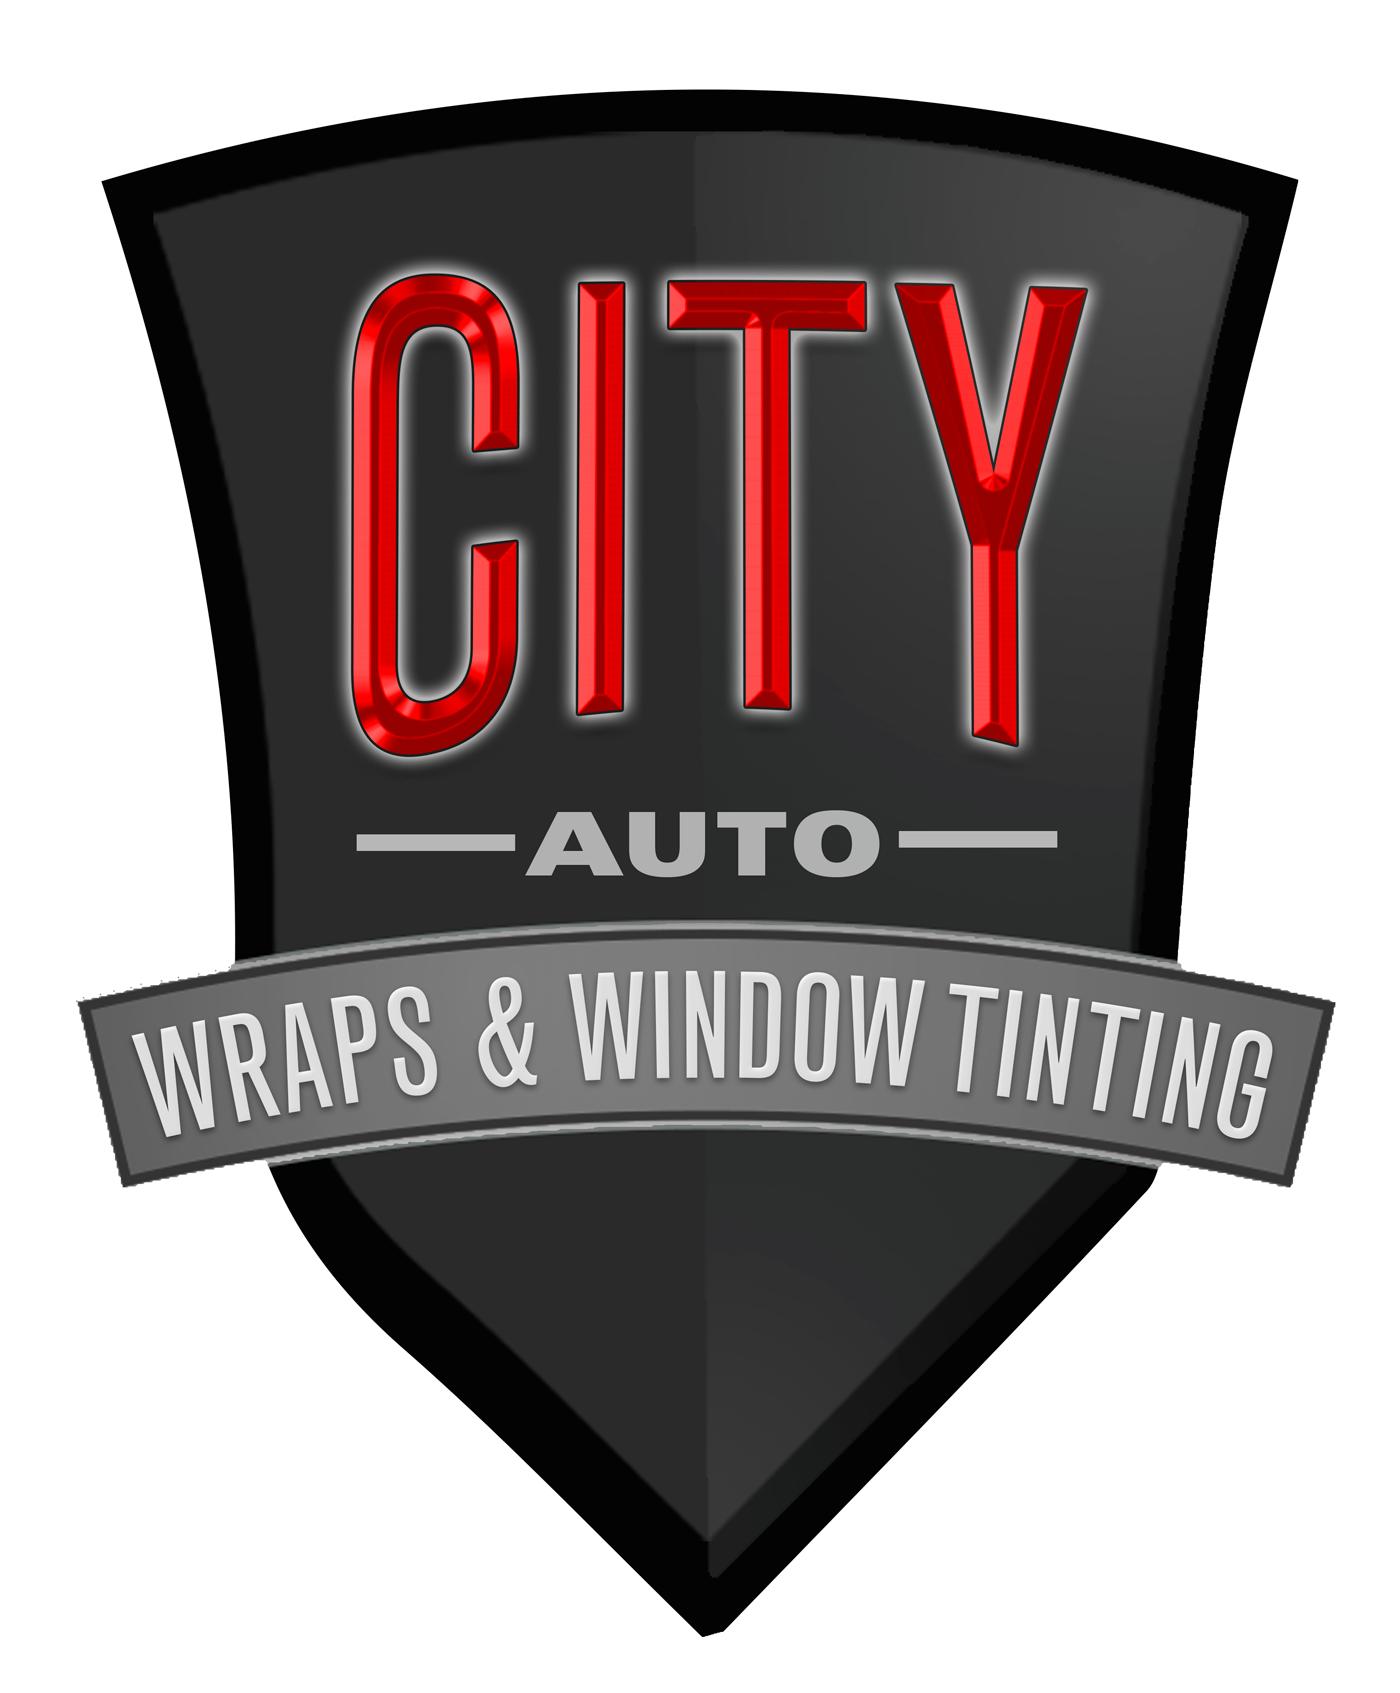 window tinting escondido city auto wraps and window tinting facebook top car window tinting companies in california click away remotes